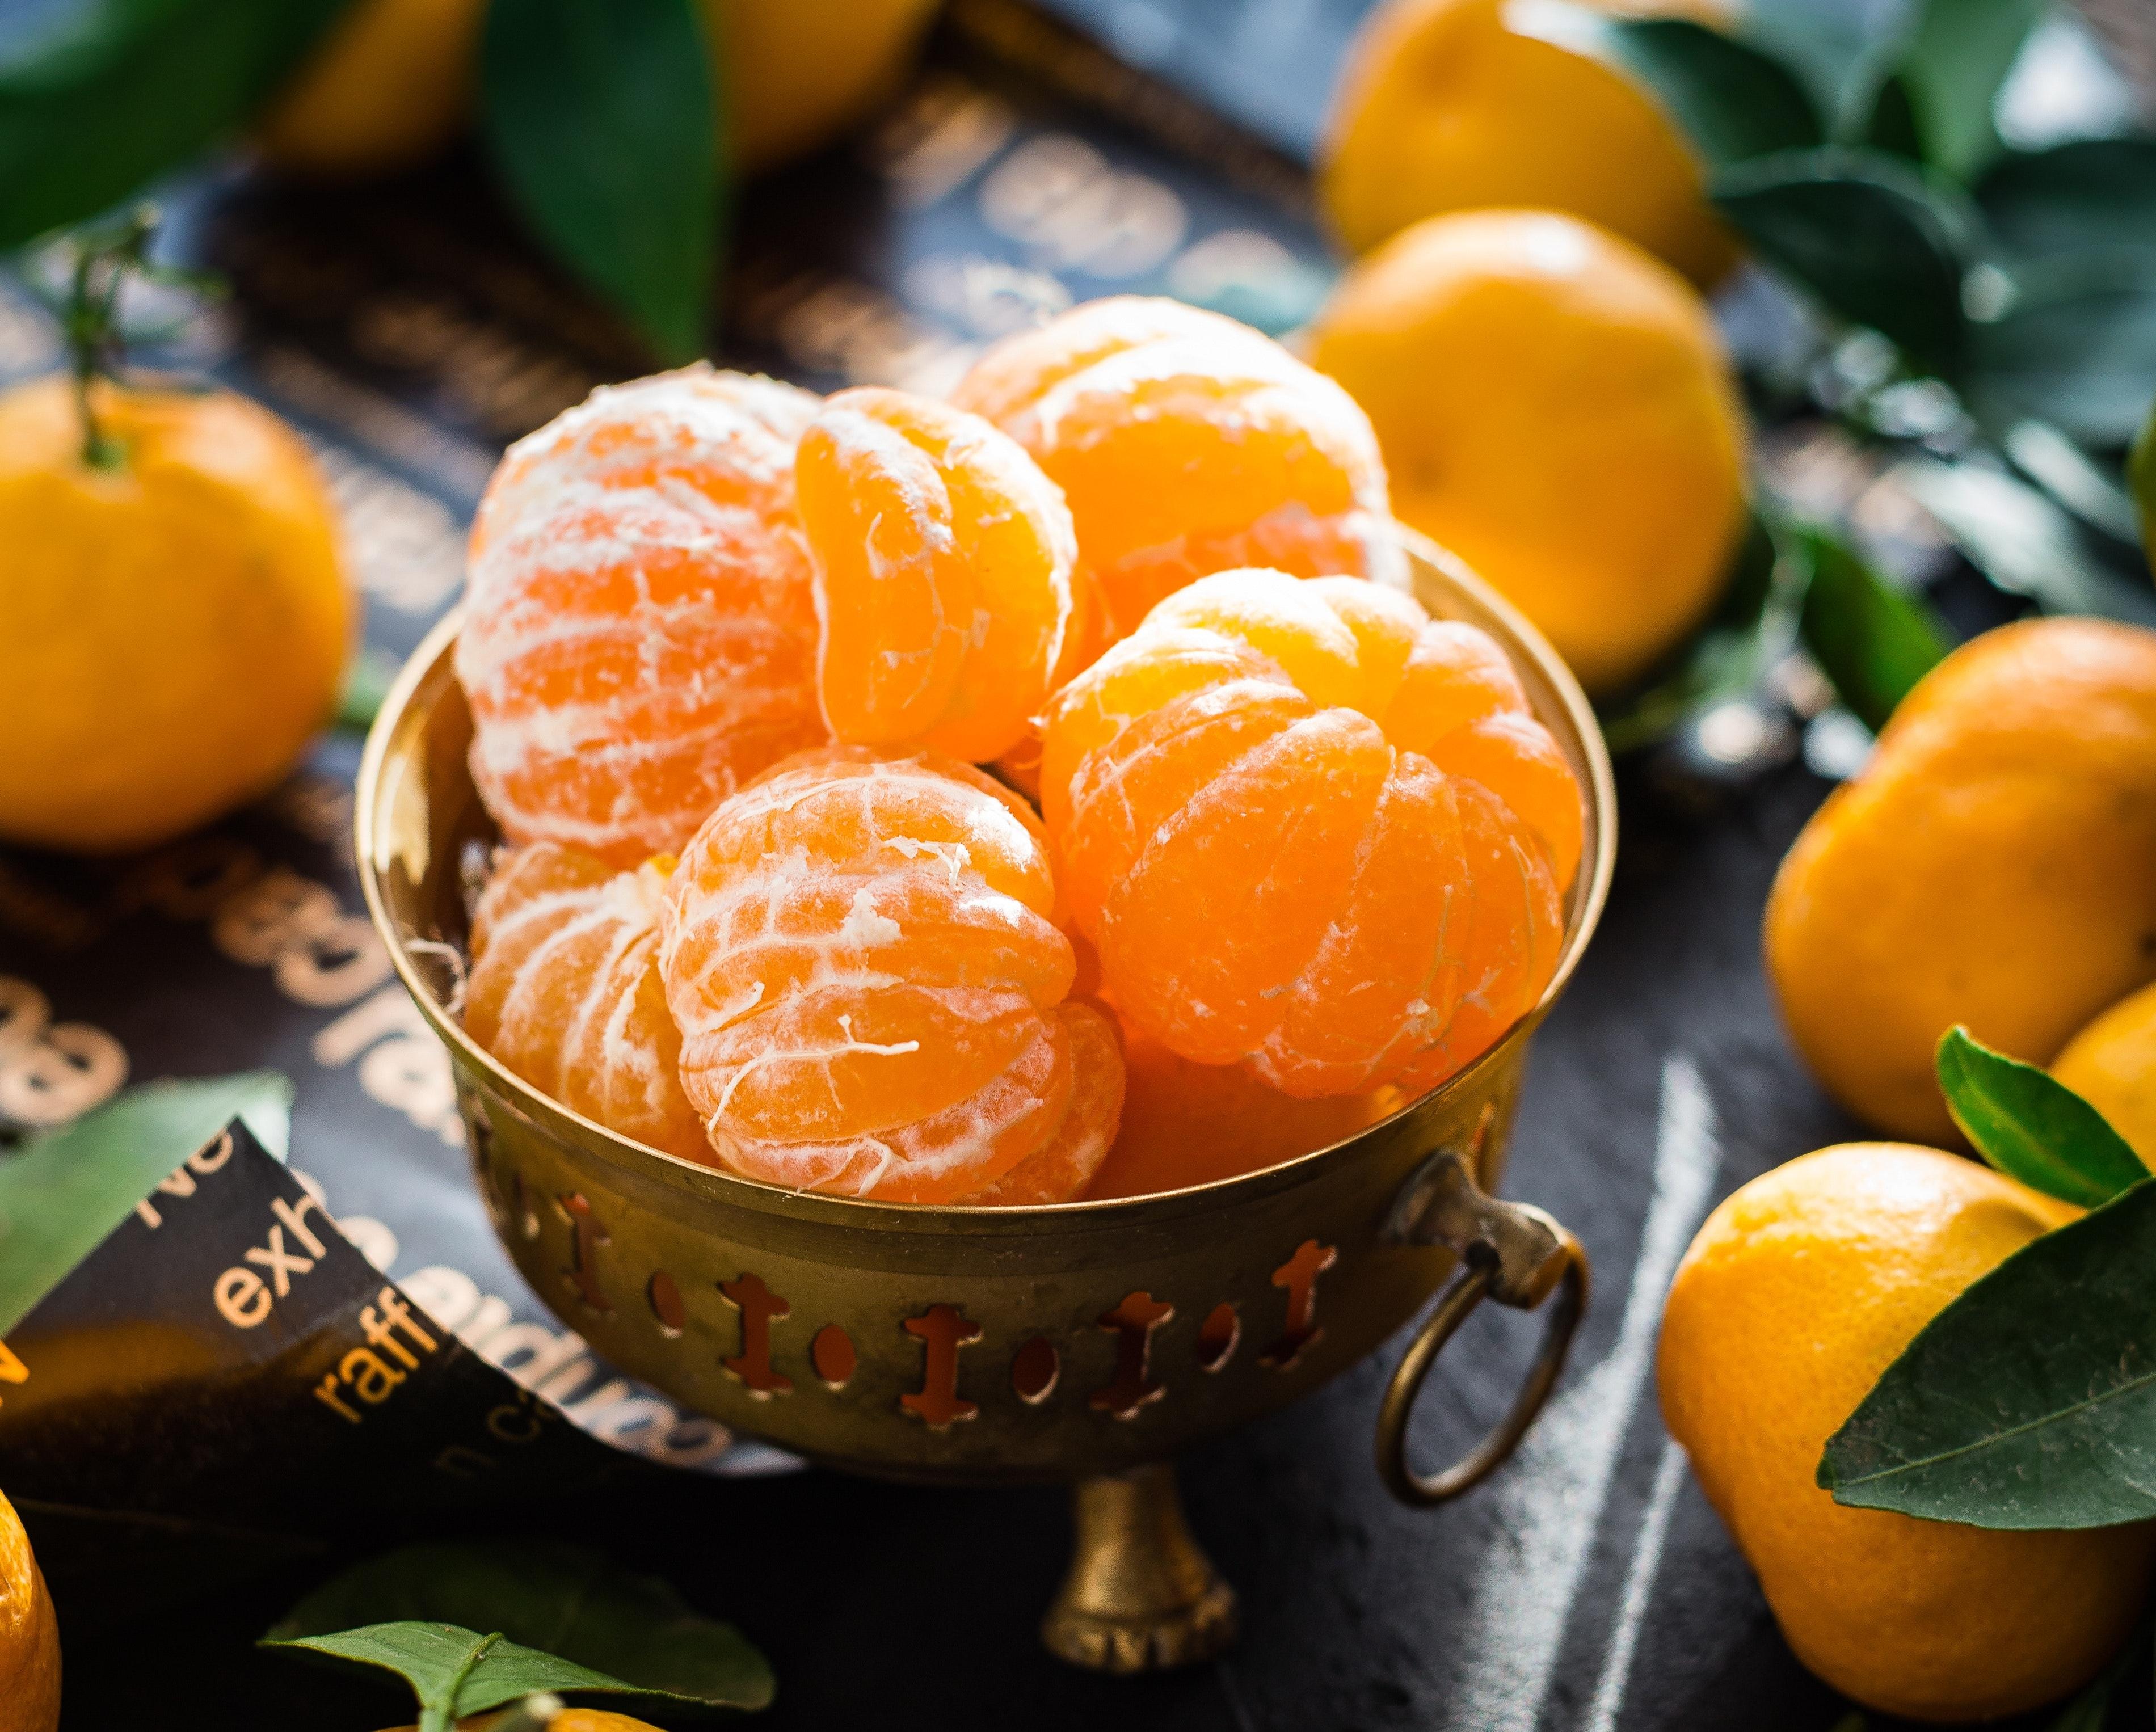 Orange to increase haemoglobin